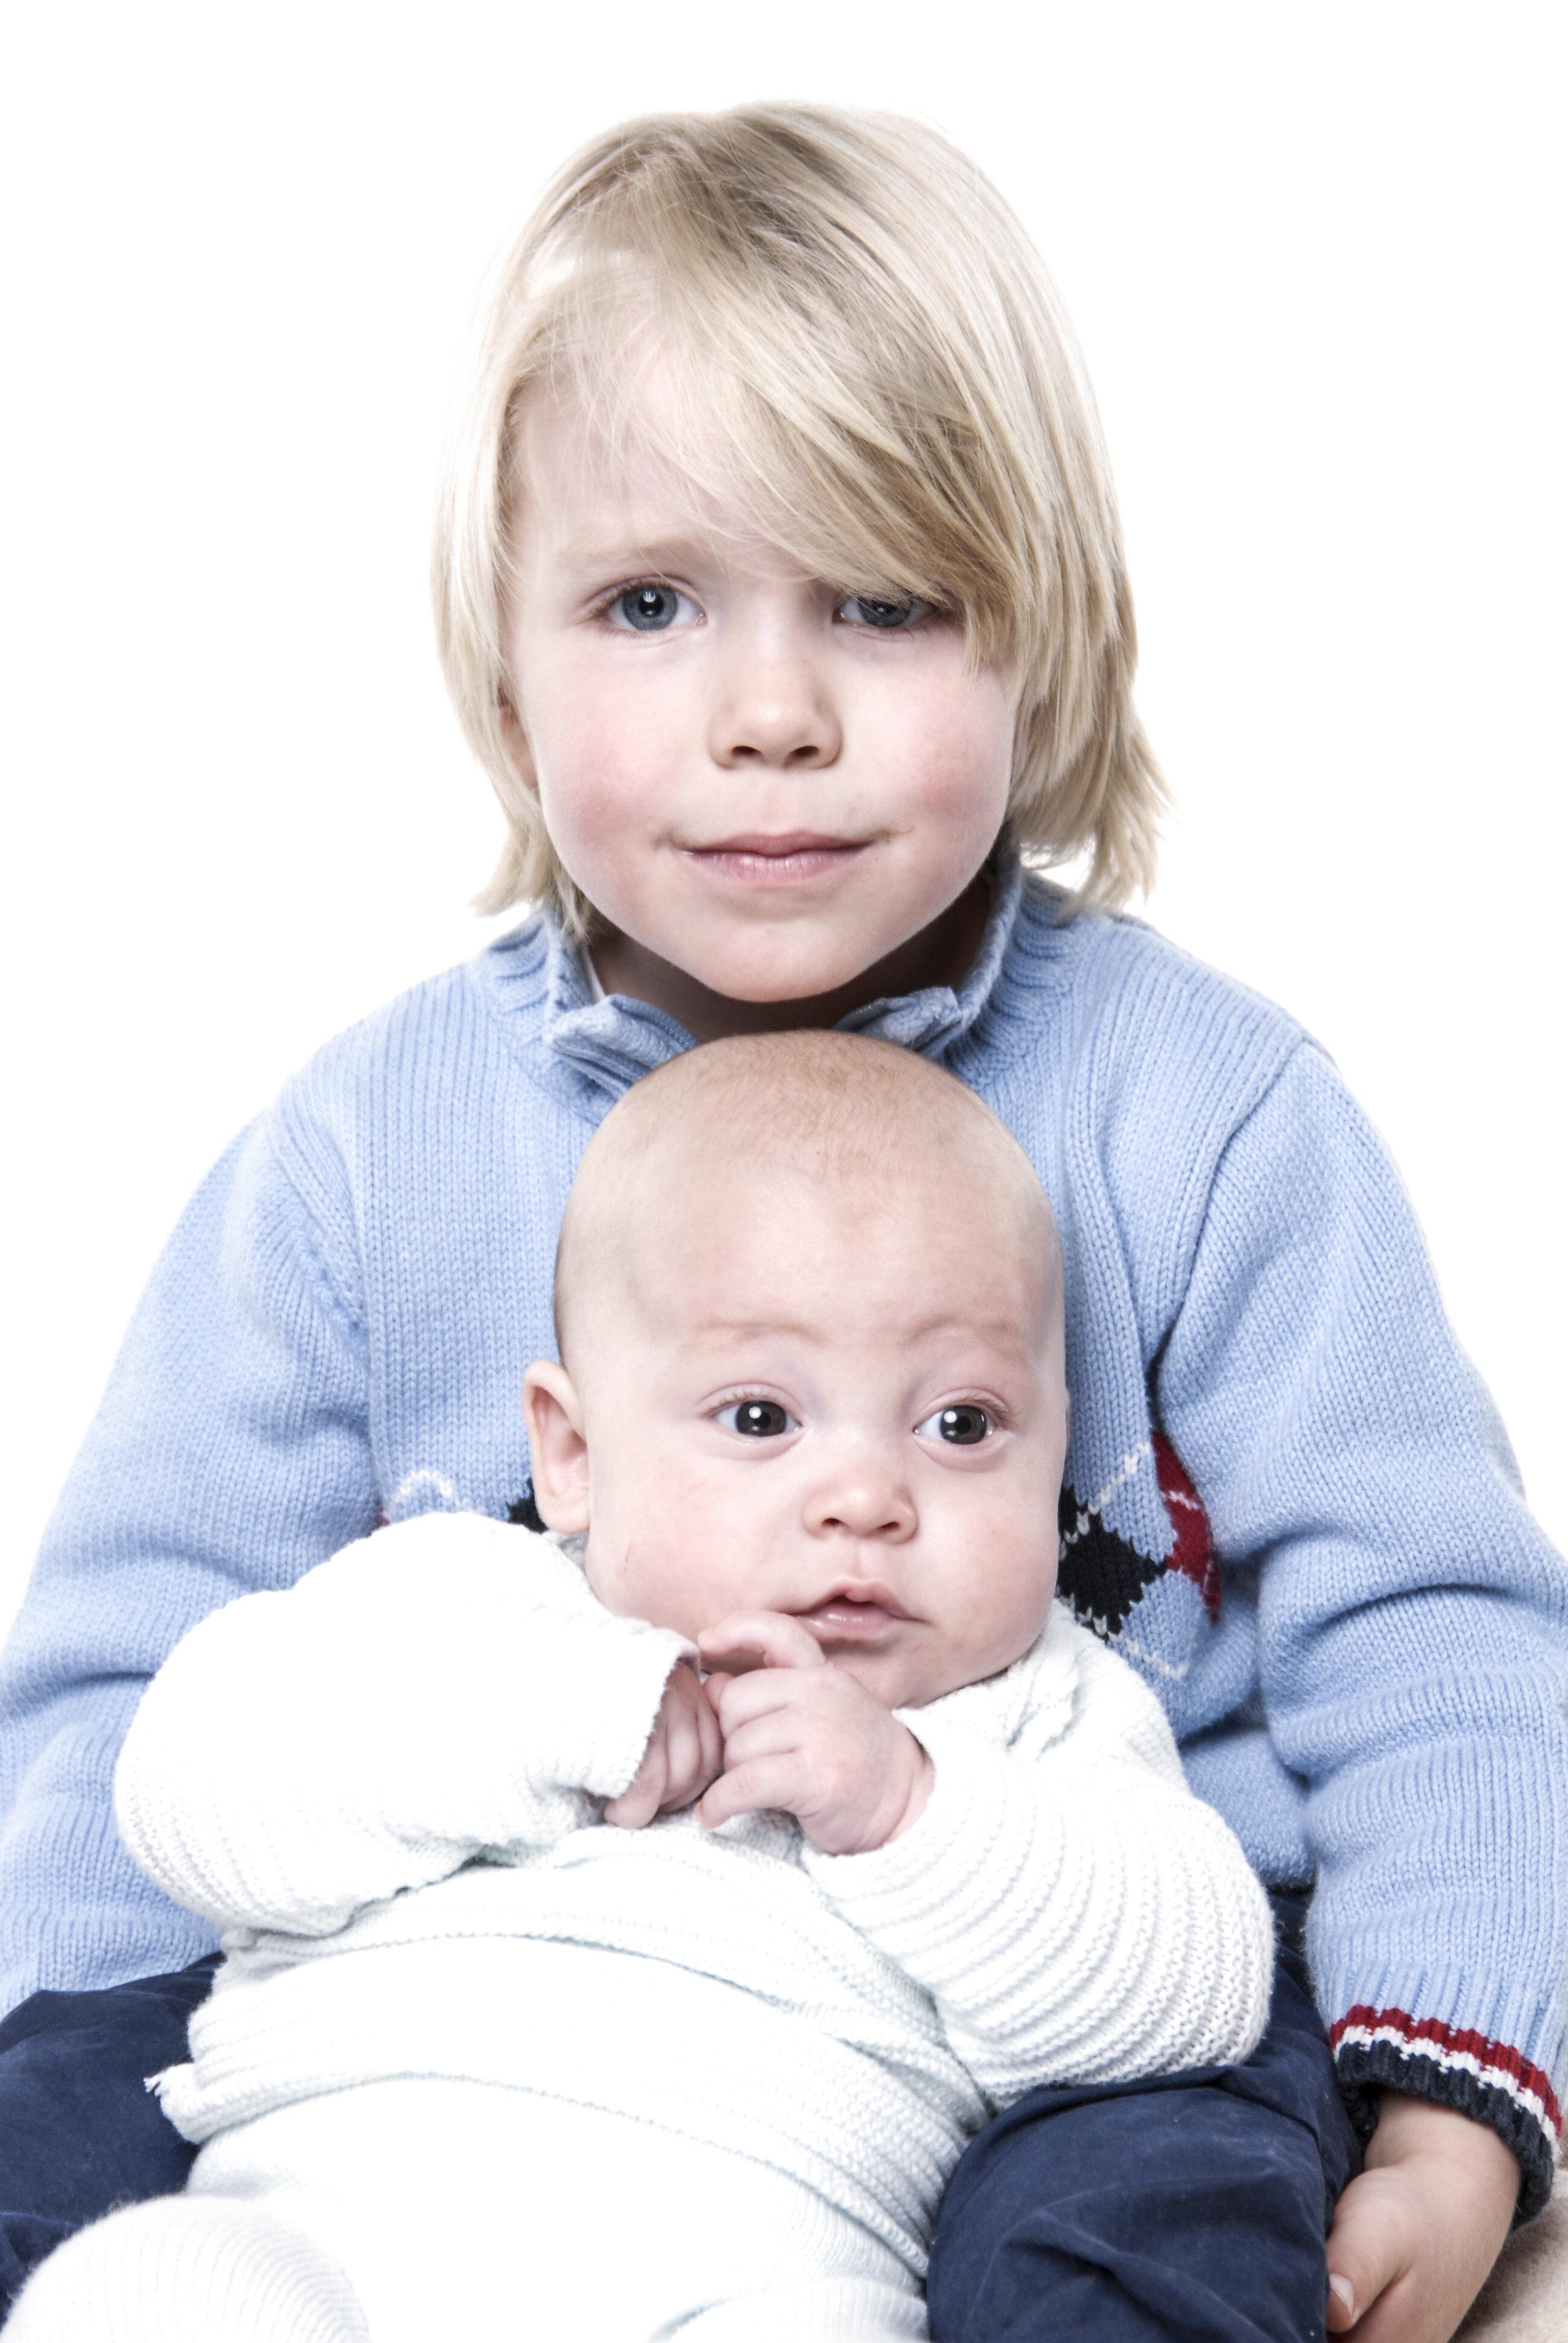 childrenportraits-portrait-kids-baby-karimmuhammadphotography.jpg